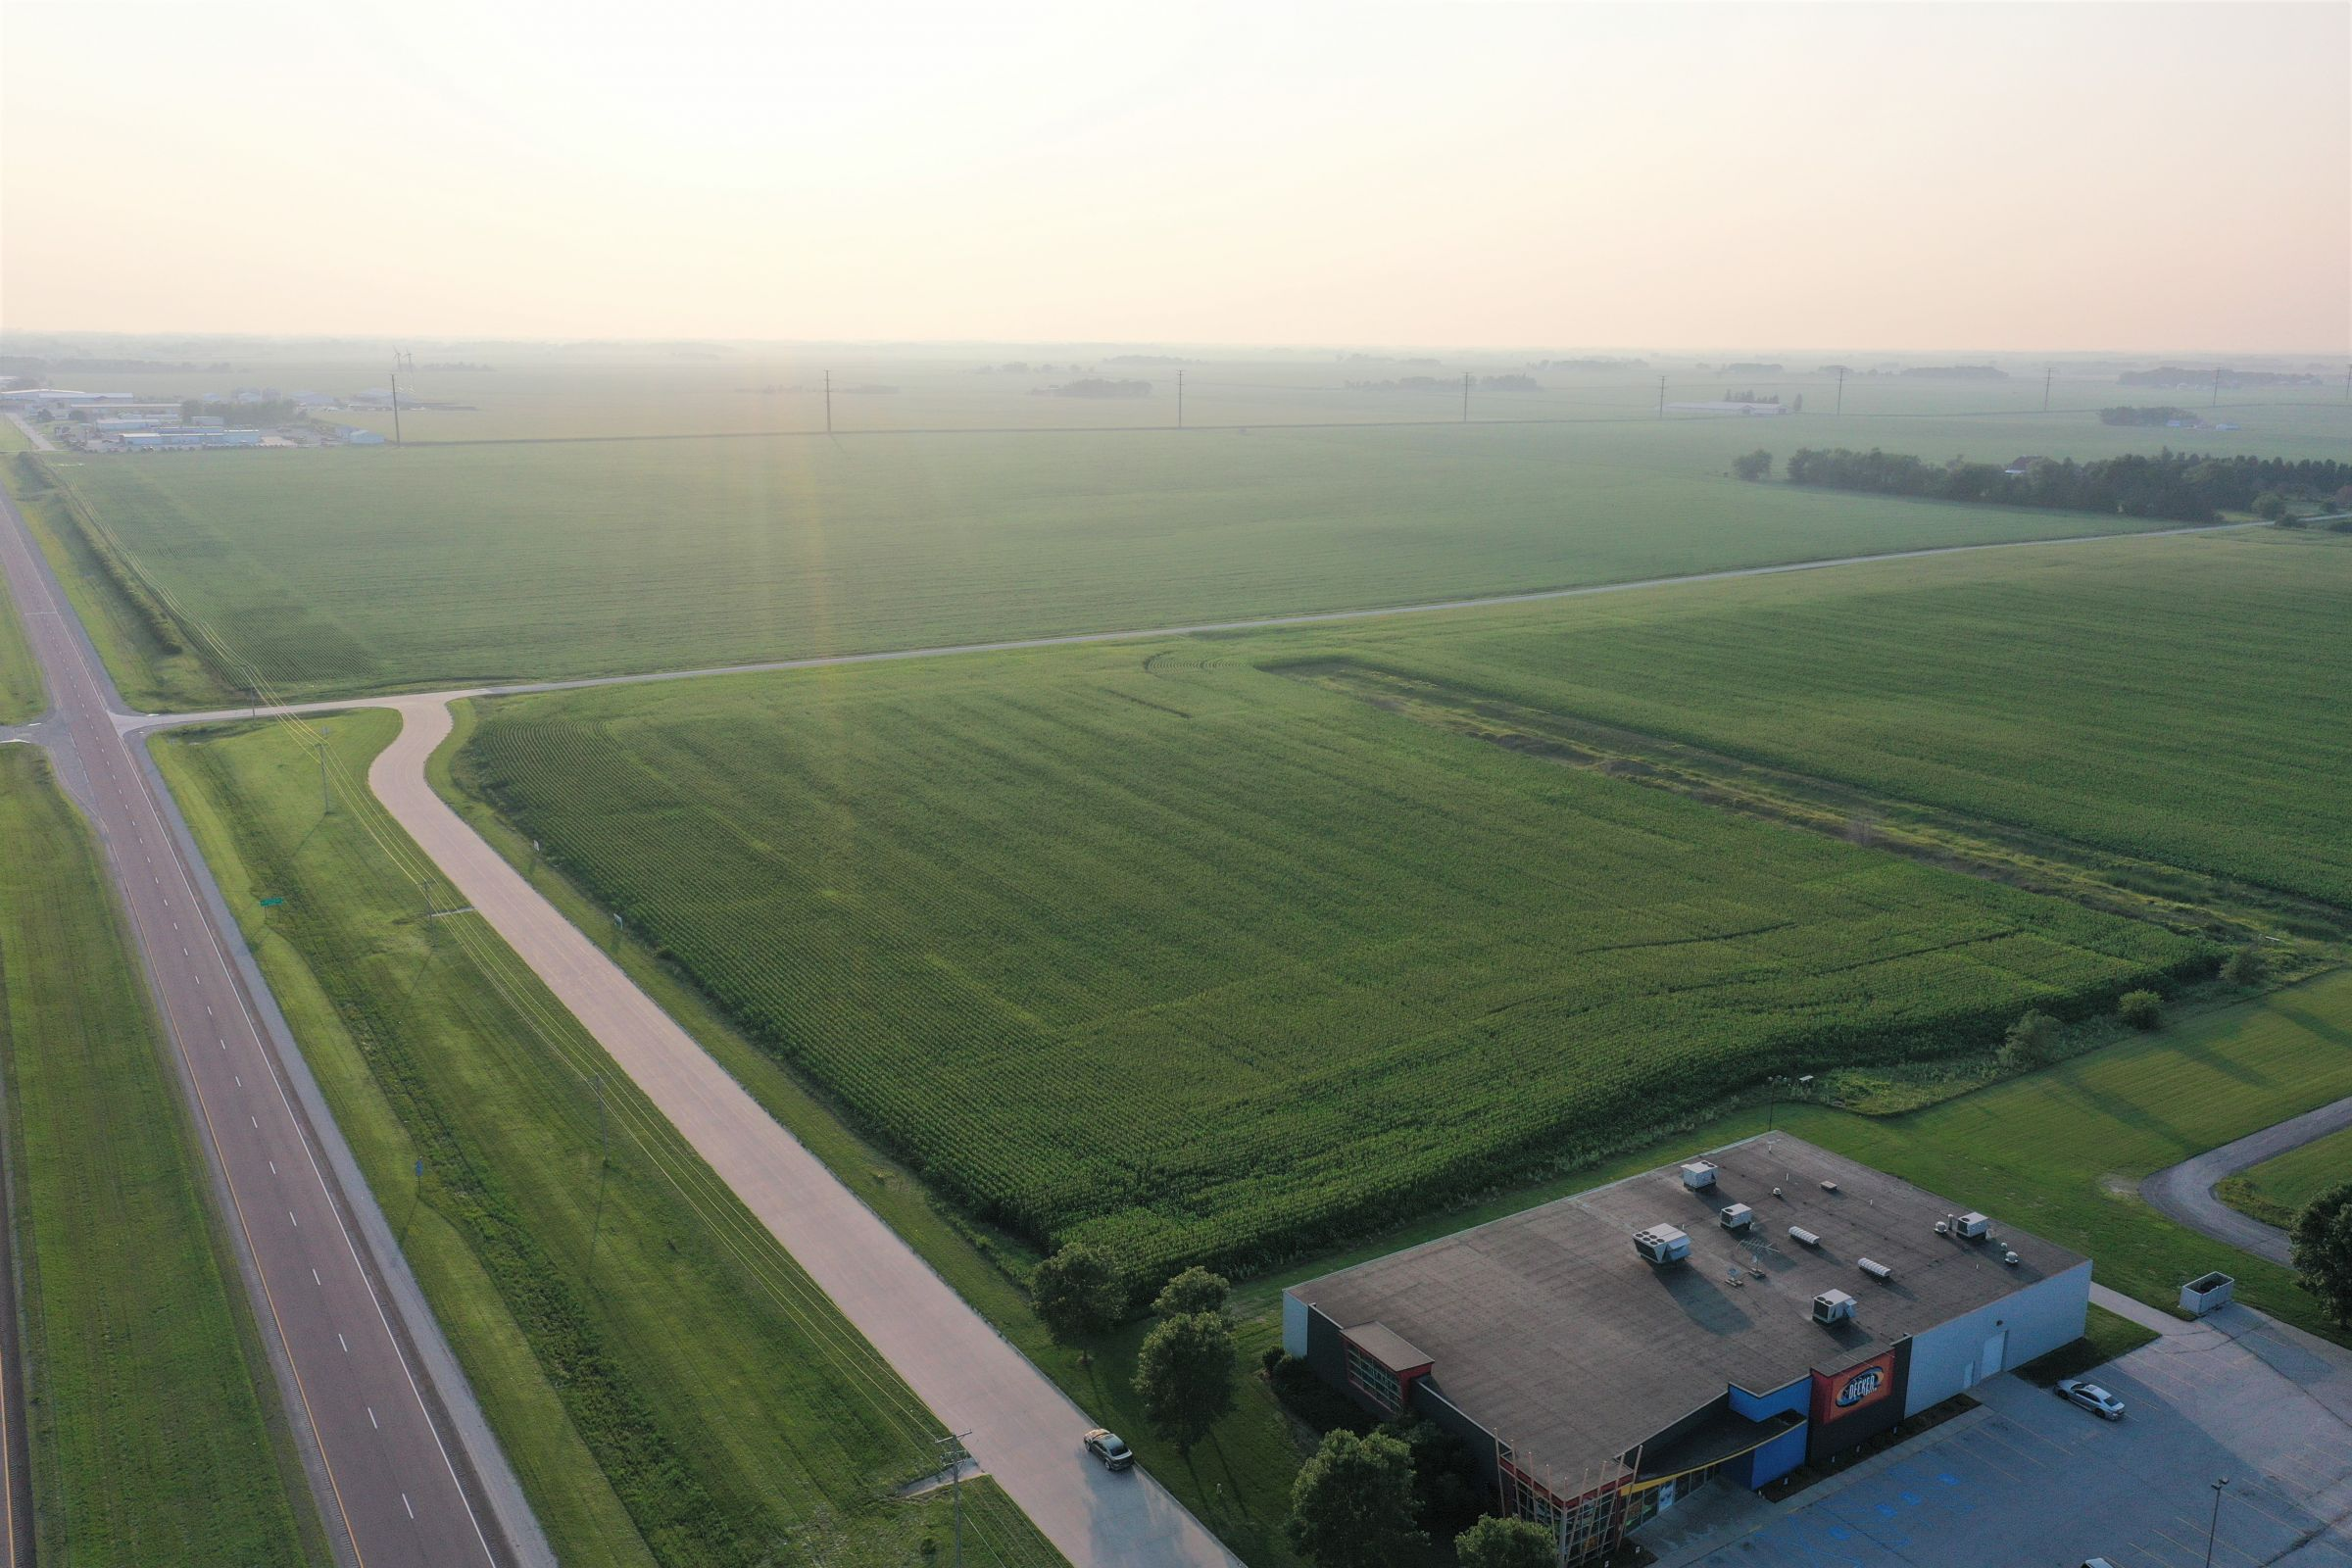 development-land-commercial-cerro-gordo-county-iowa-4-acres-listing-number-15642-0-2021-07-19-160046.jpg